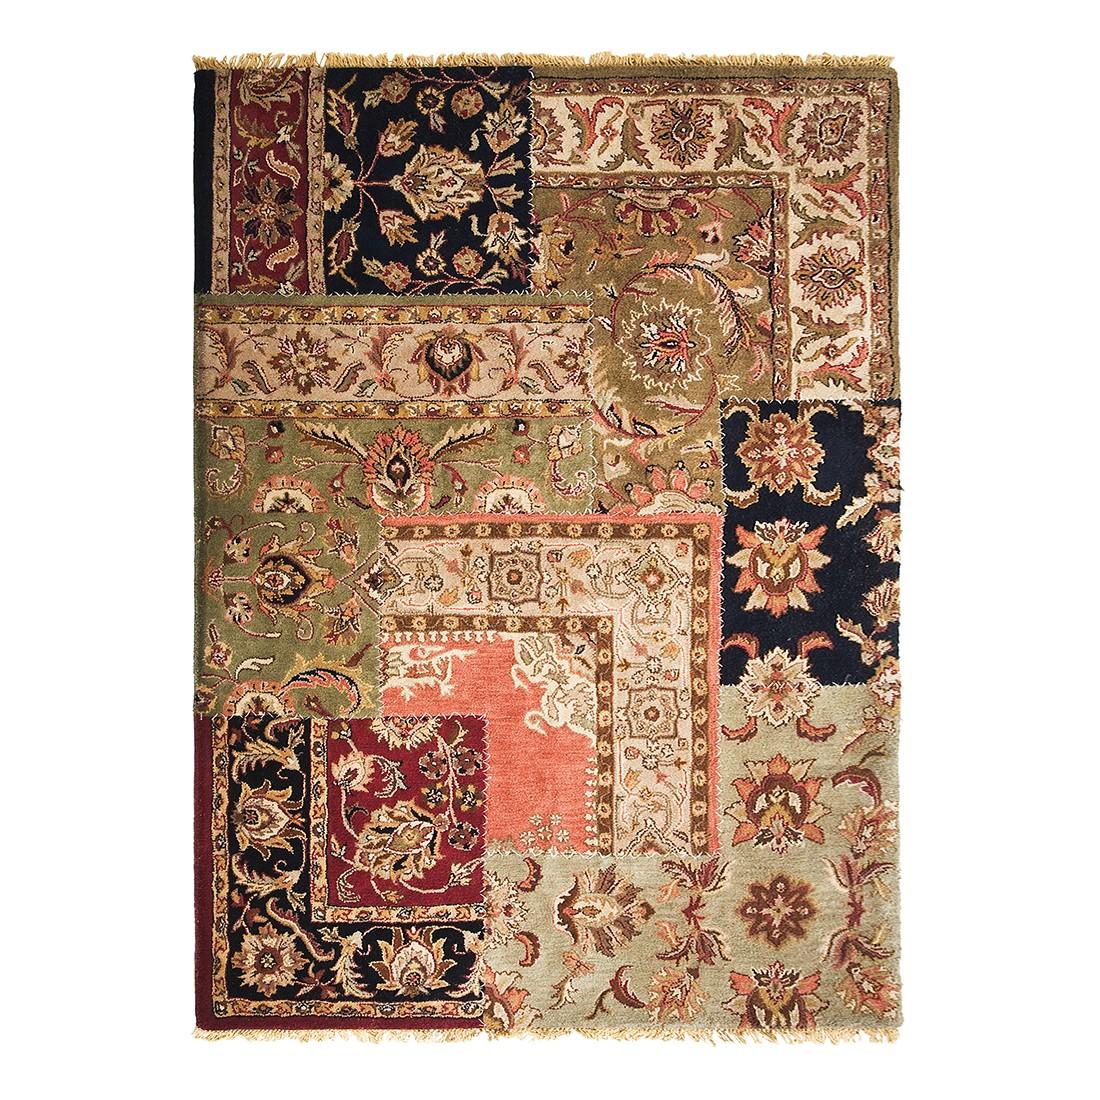 Teppich Persian Patchwork - Wolle Mehrfarbig - 300 cm x 200 cm Kare Design